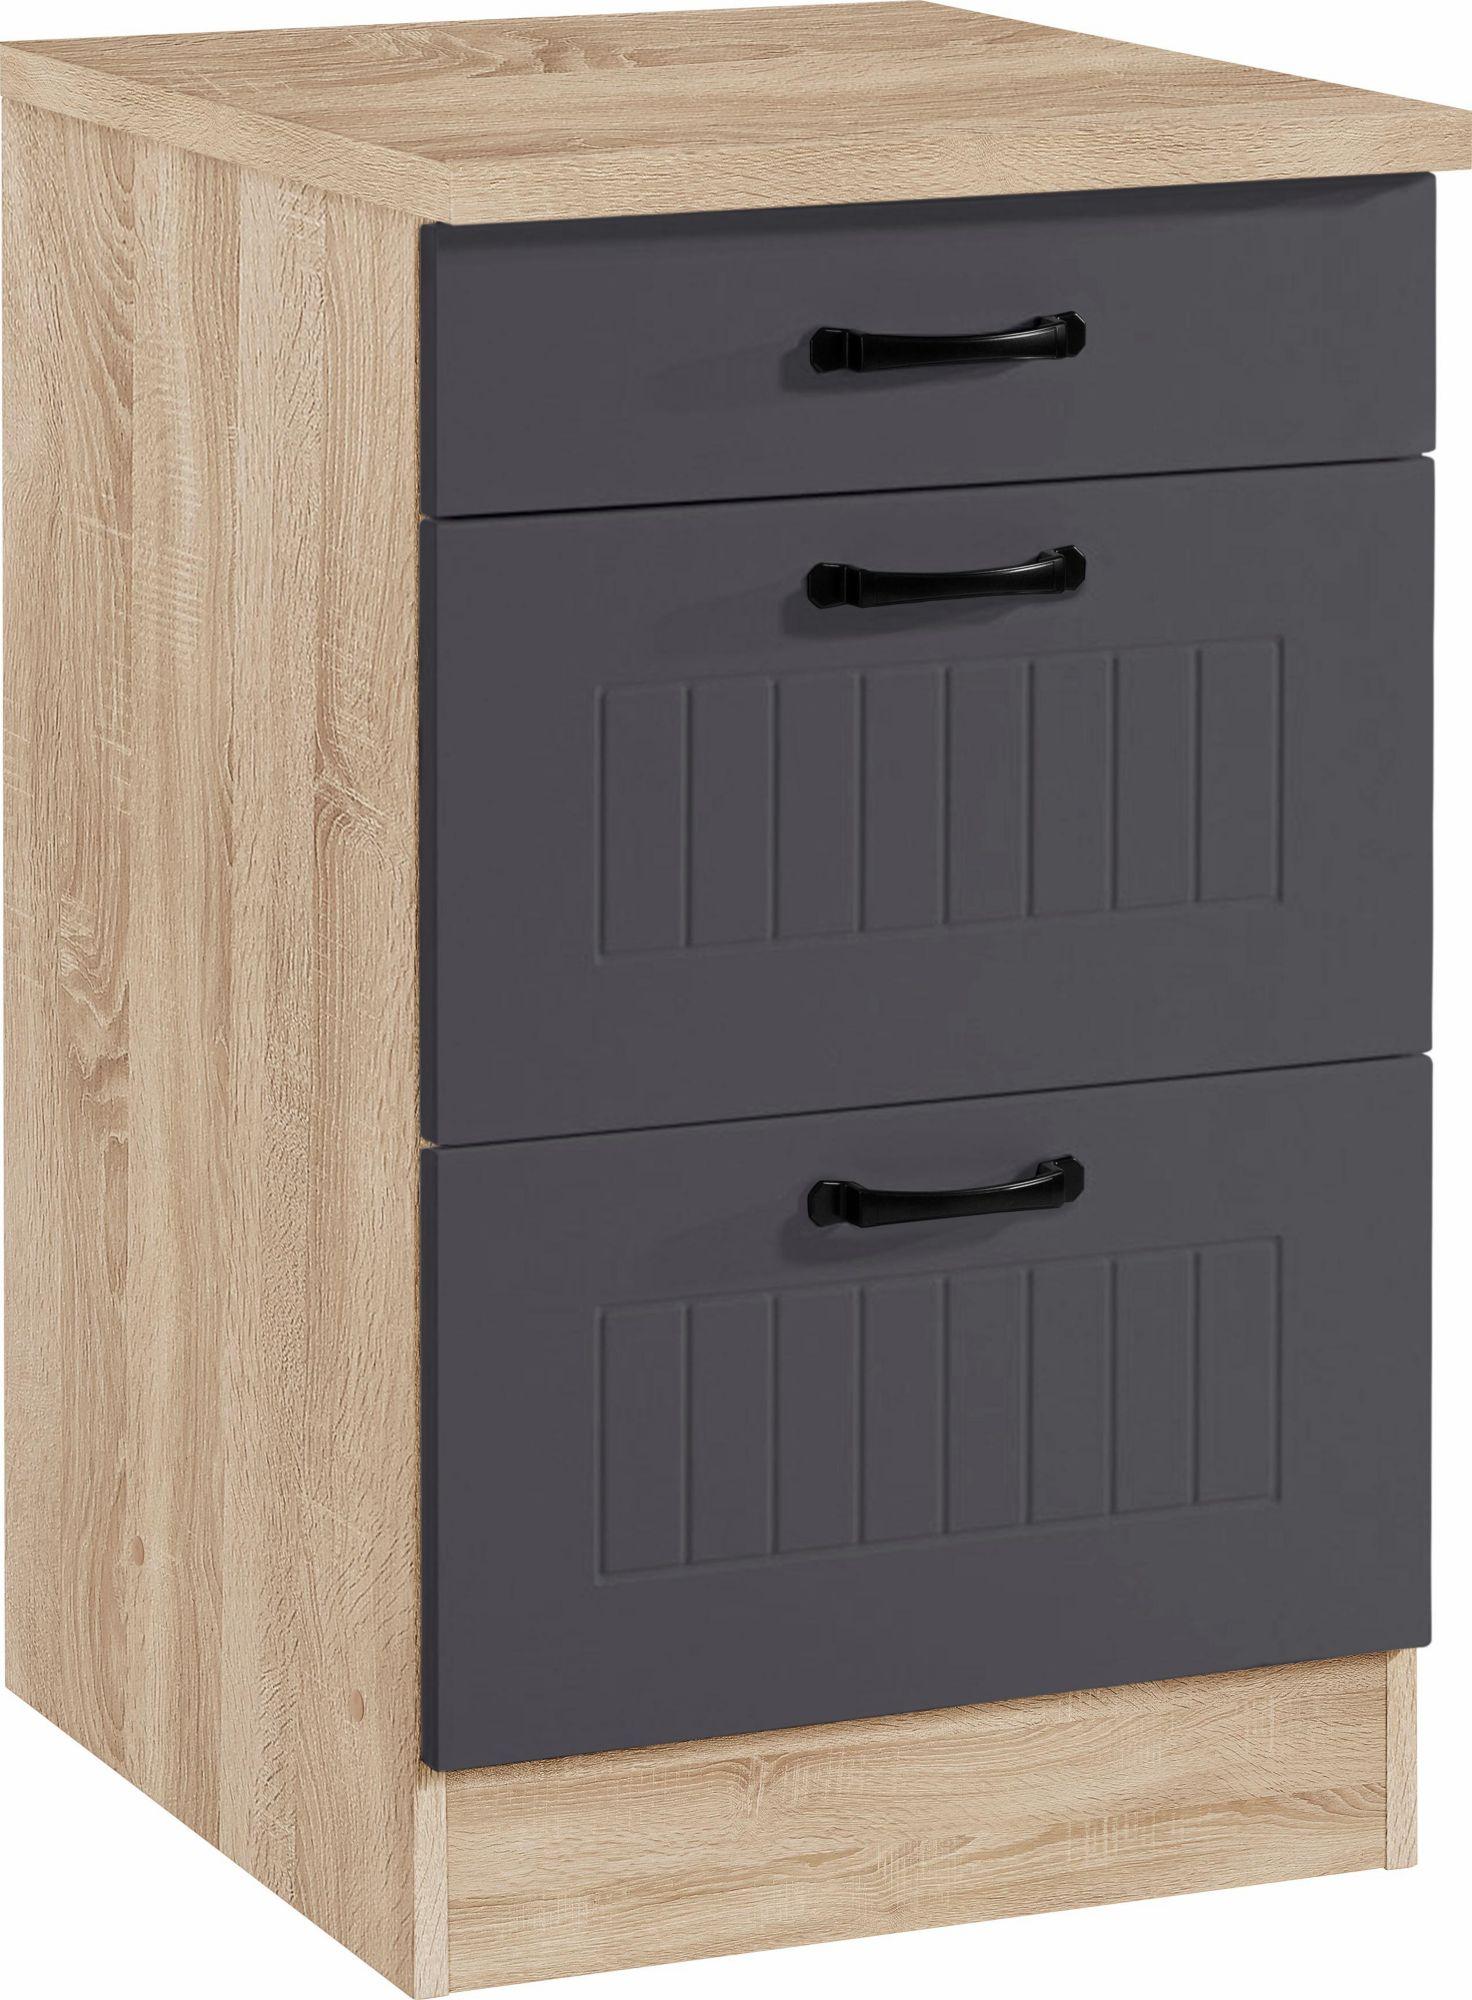 unterschrank held m bel athen schwab versand. Black Bedroom Furniture Sets. Home Design Ideas